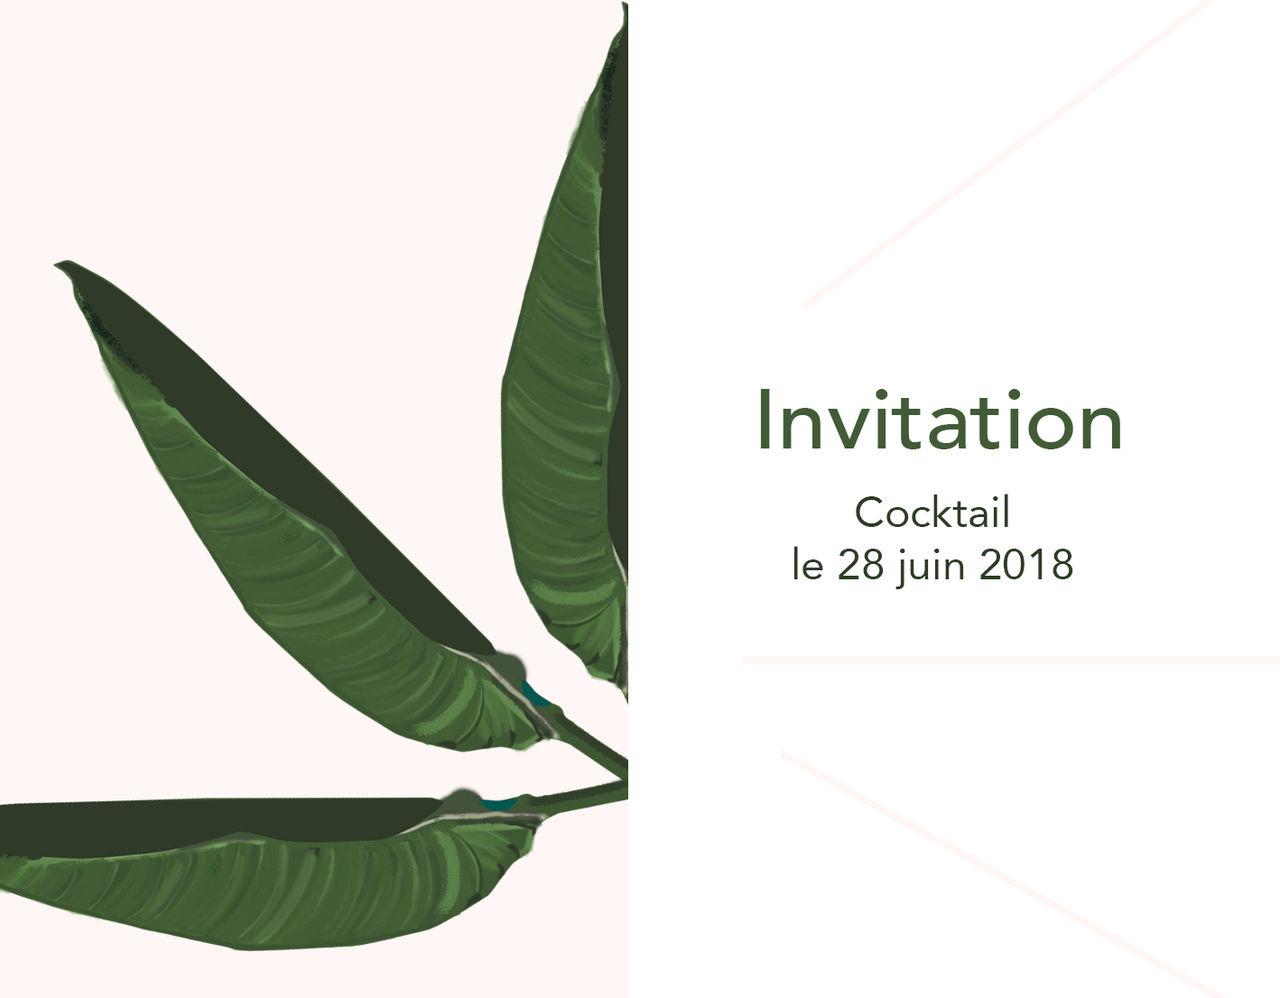 Invitation / cocktail 2018